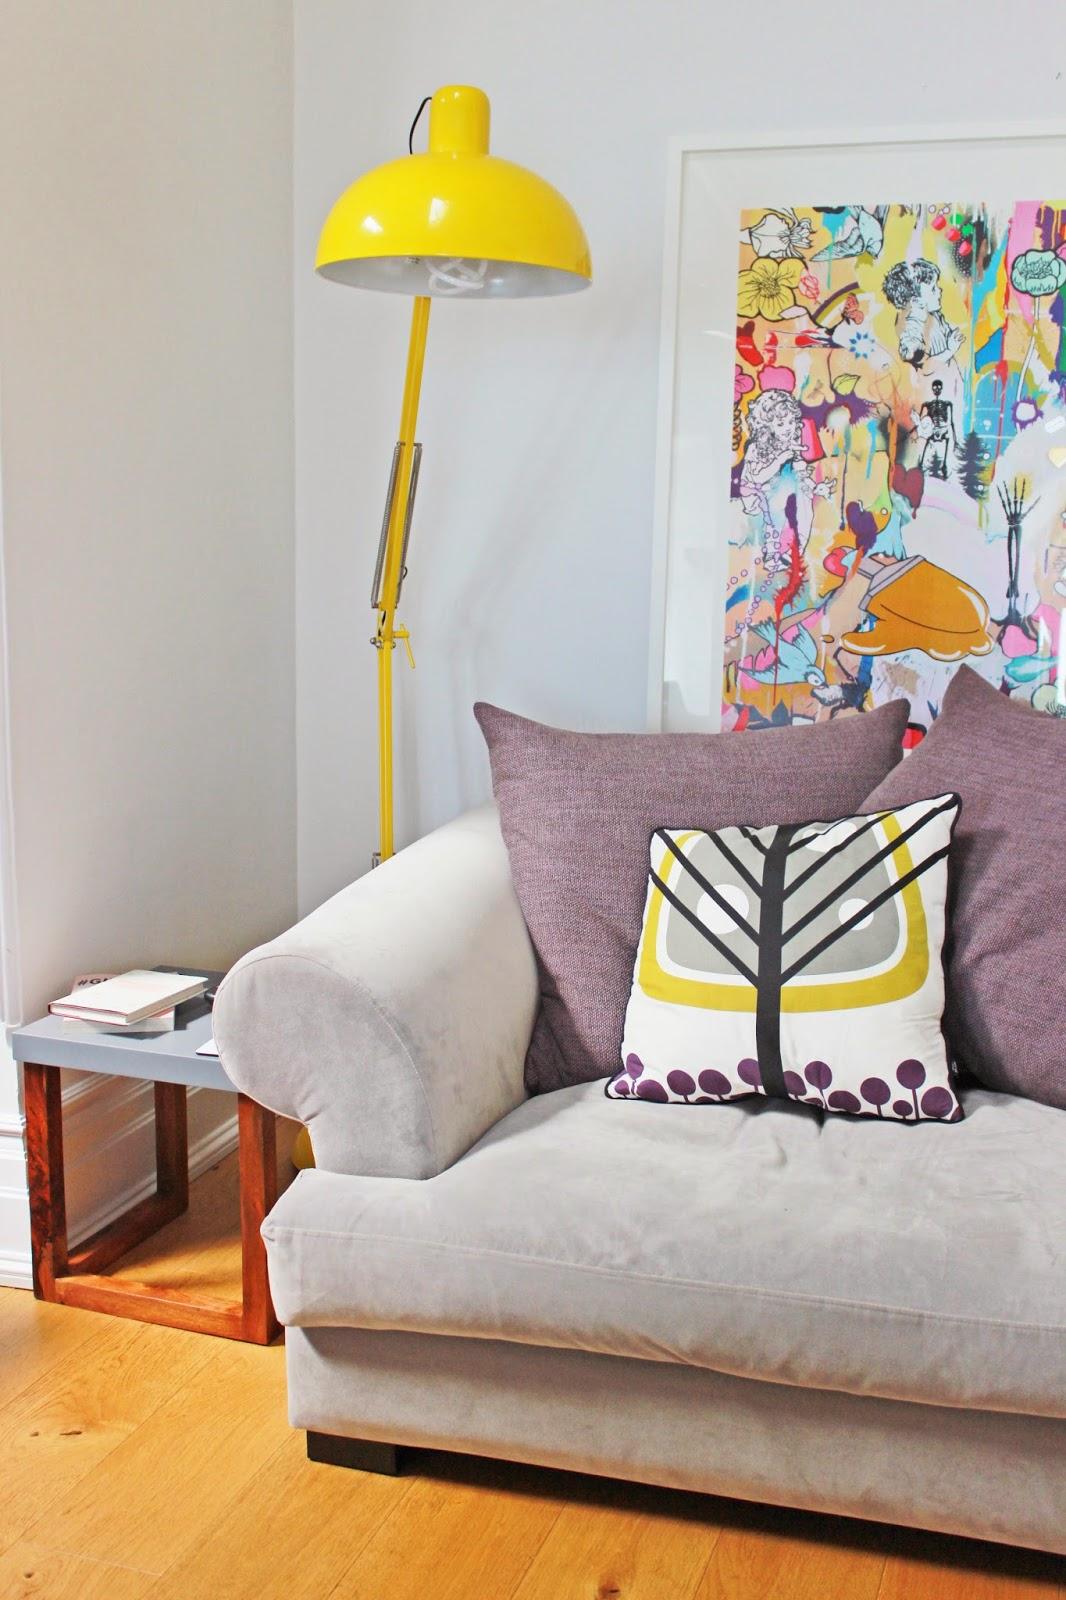 Interior | A Peek Inside Zoella Living Room | LOSTINOURMIND